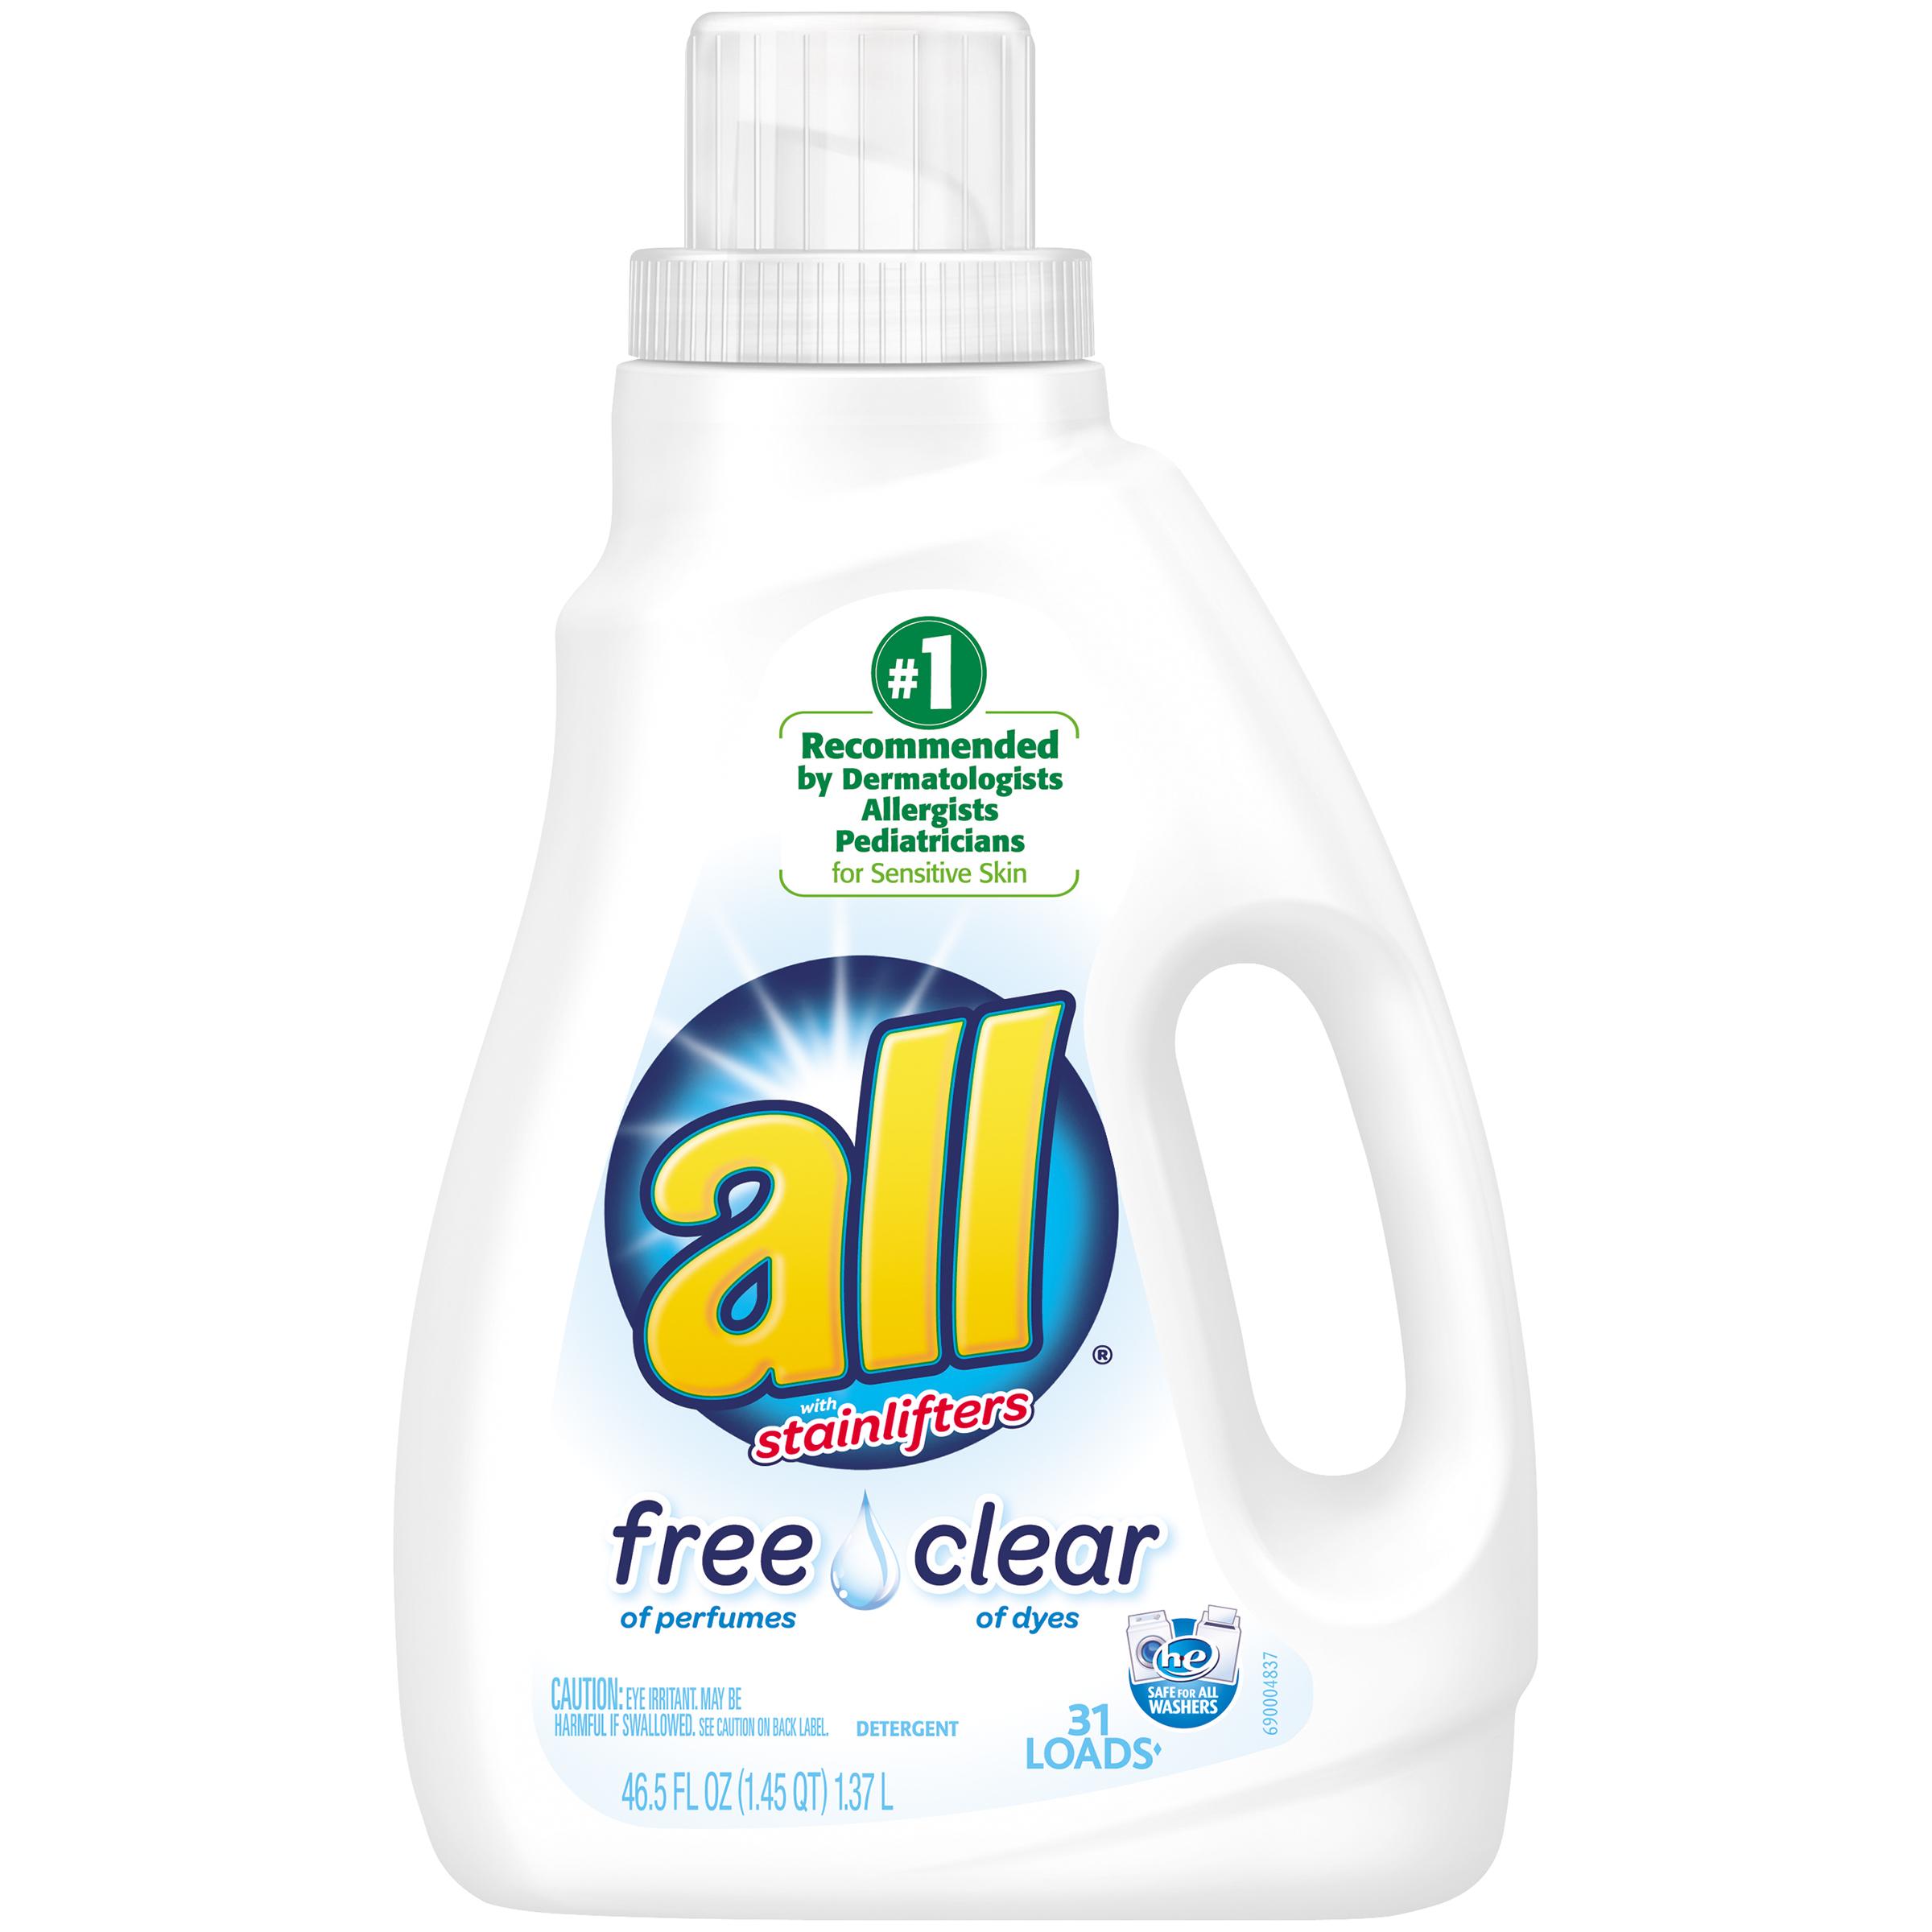 Image of All Detergent, Free Clear, 46.5 fl oz (1.45 qt) 1.37 lt